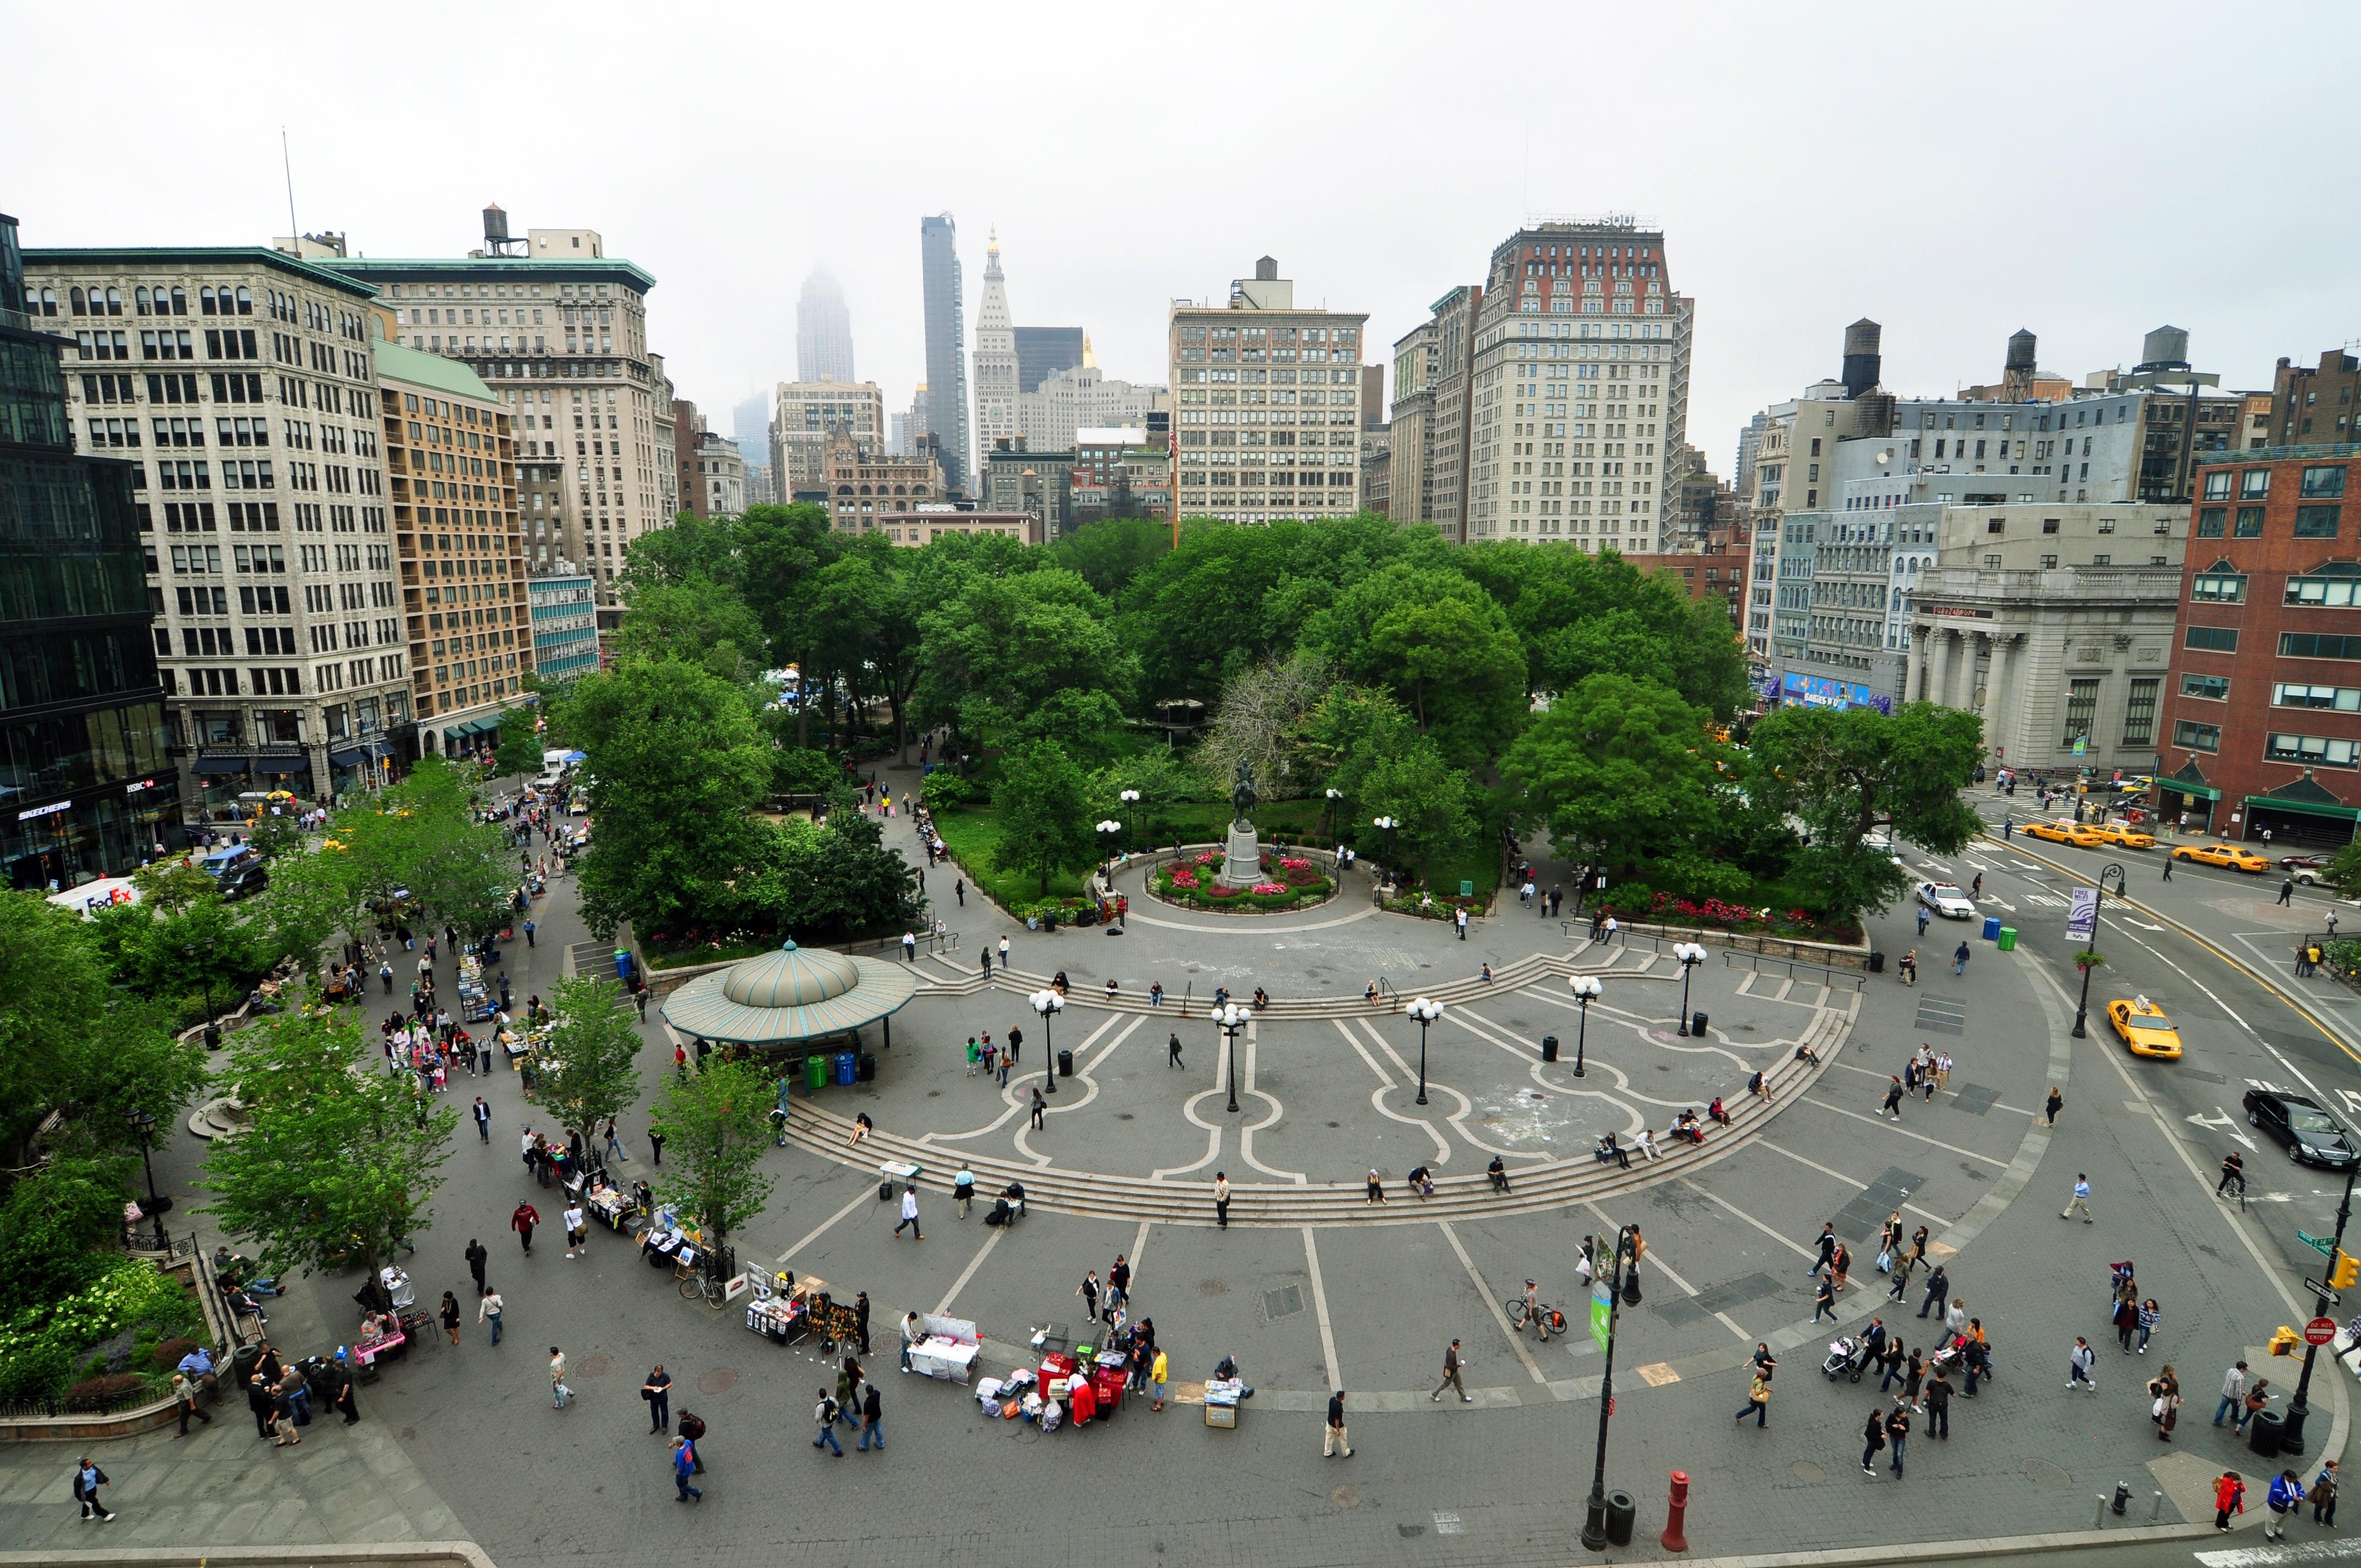 1_new_york_city_union_square_2010.jpg